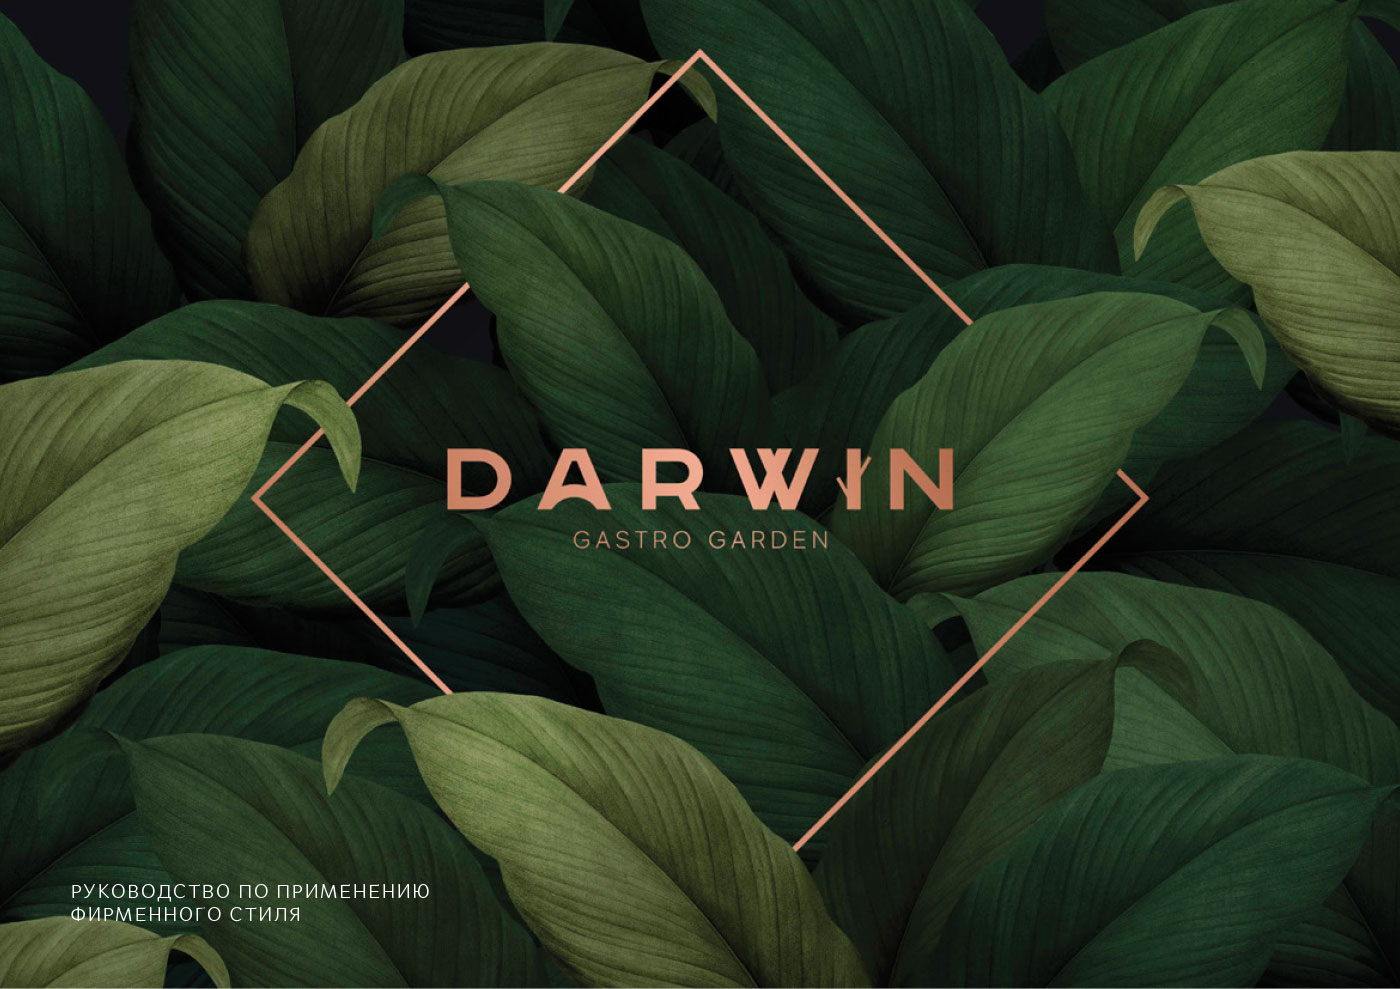 Фирменный стиль ресторана Darwin